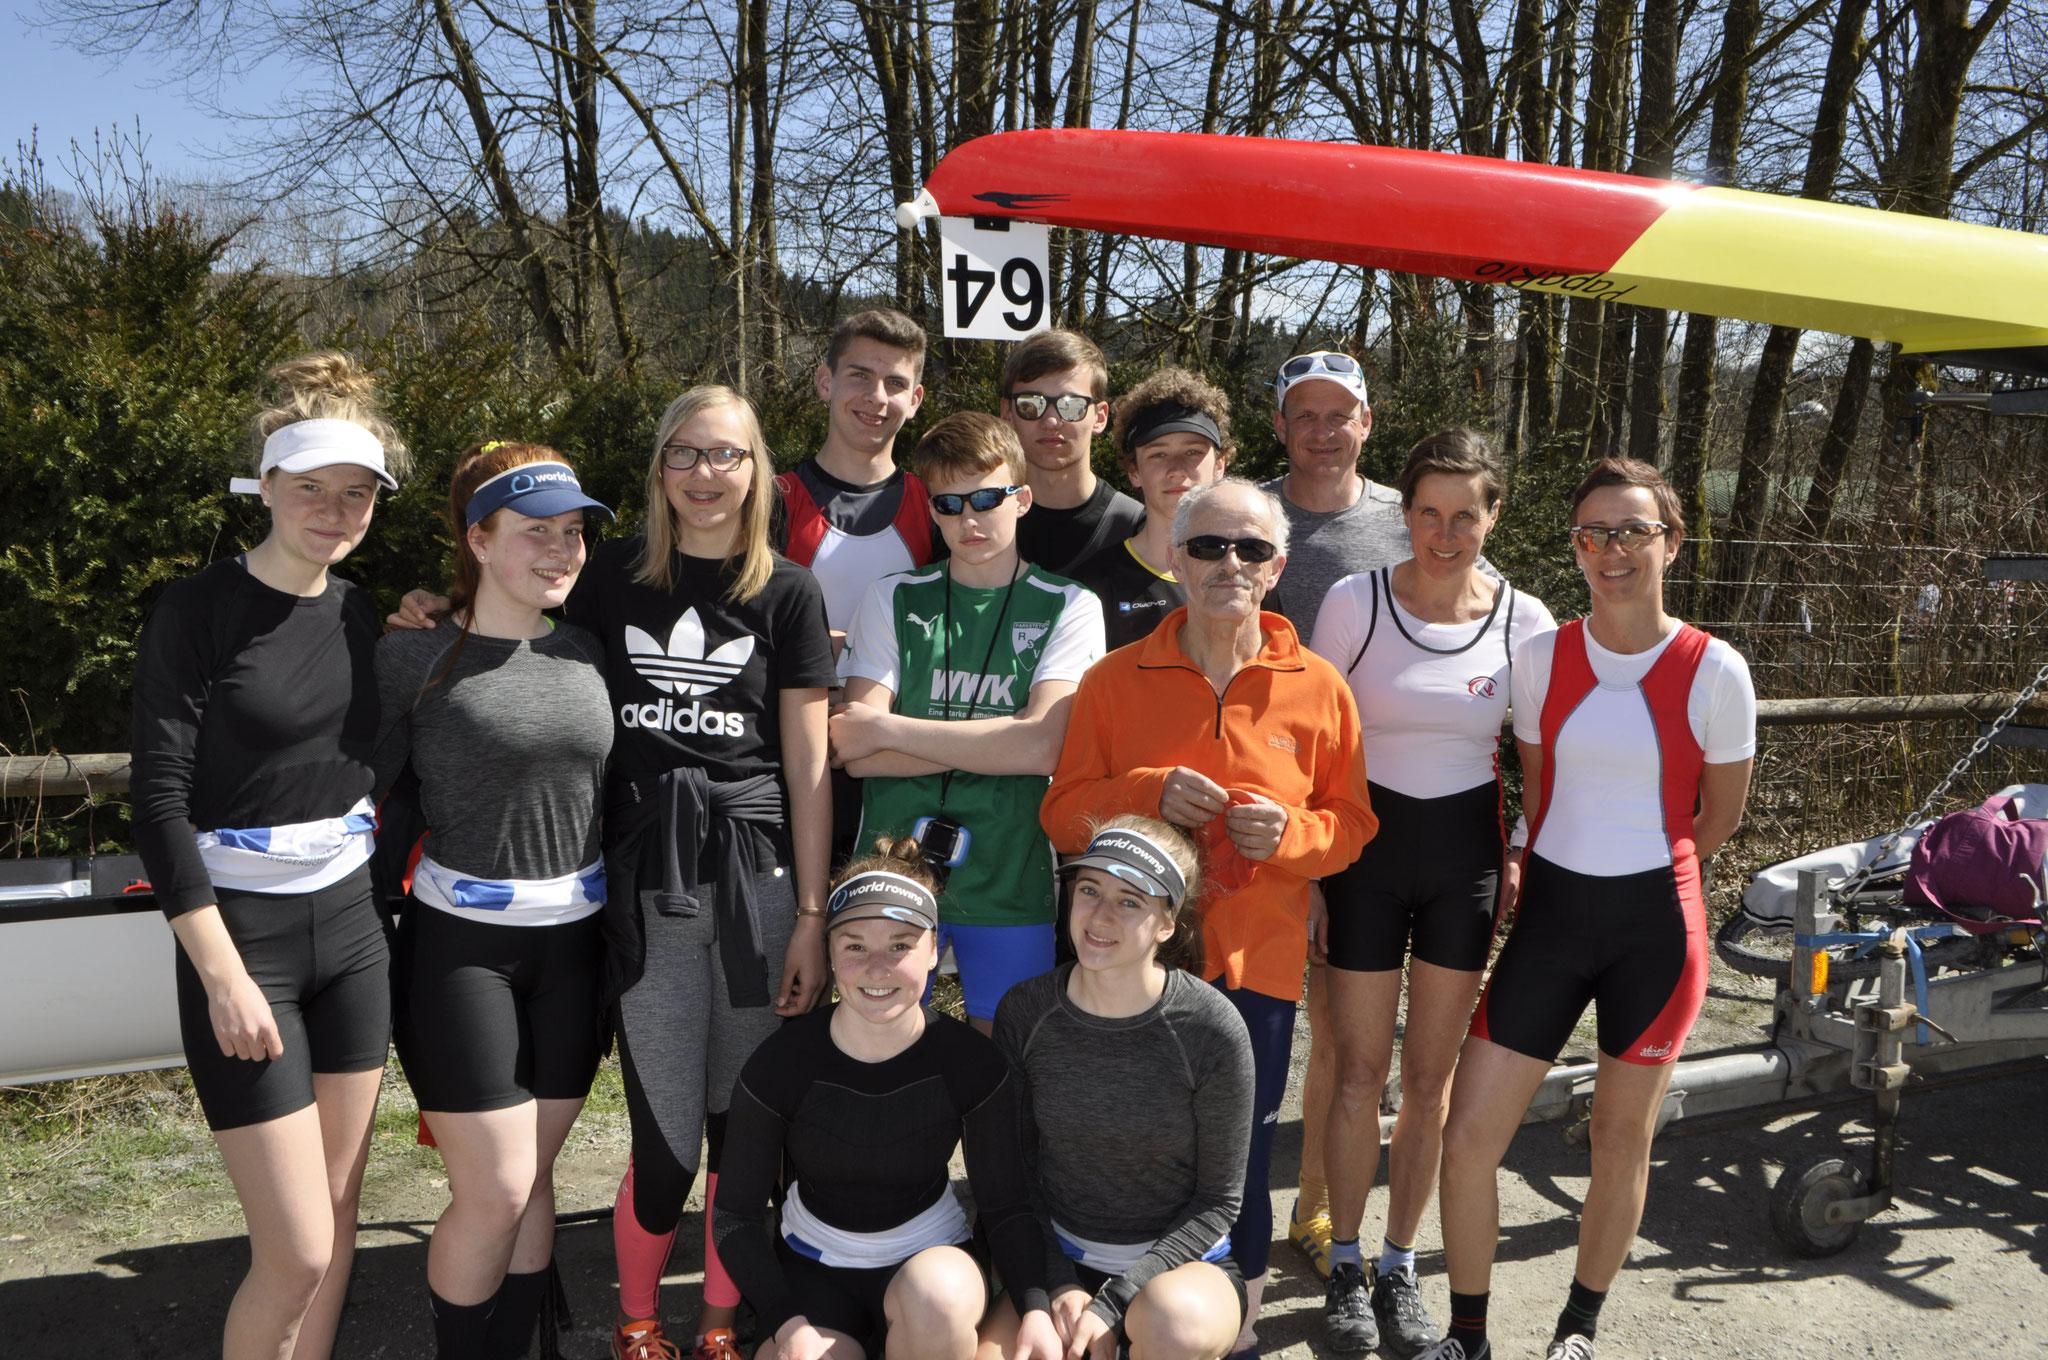 Mannschaft beim Inn River Race, 2te vr Vorsitzende Brigitte Bezold